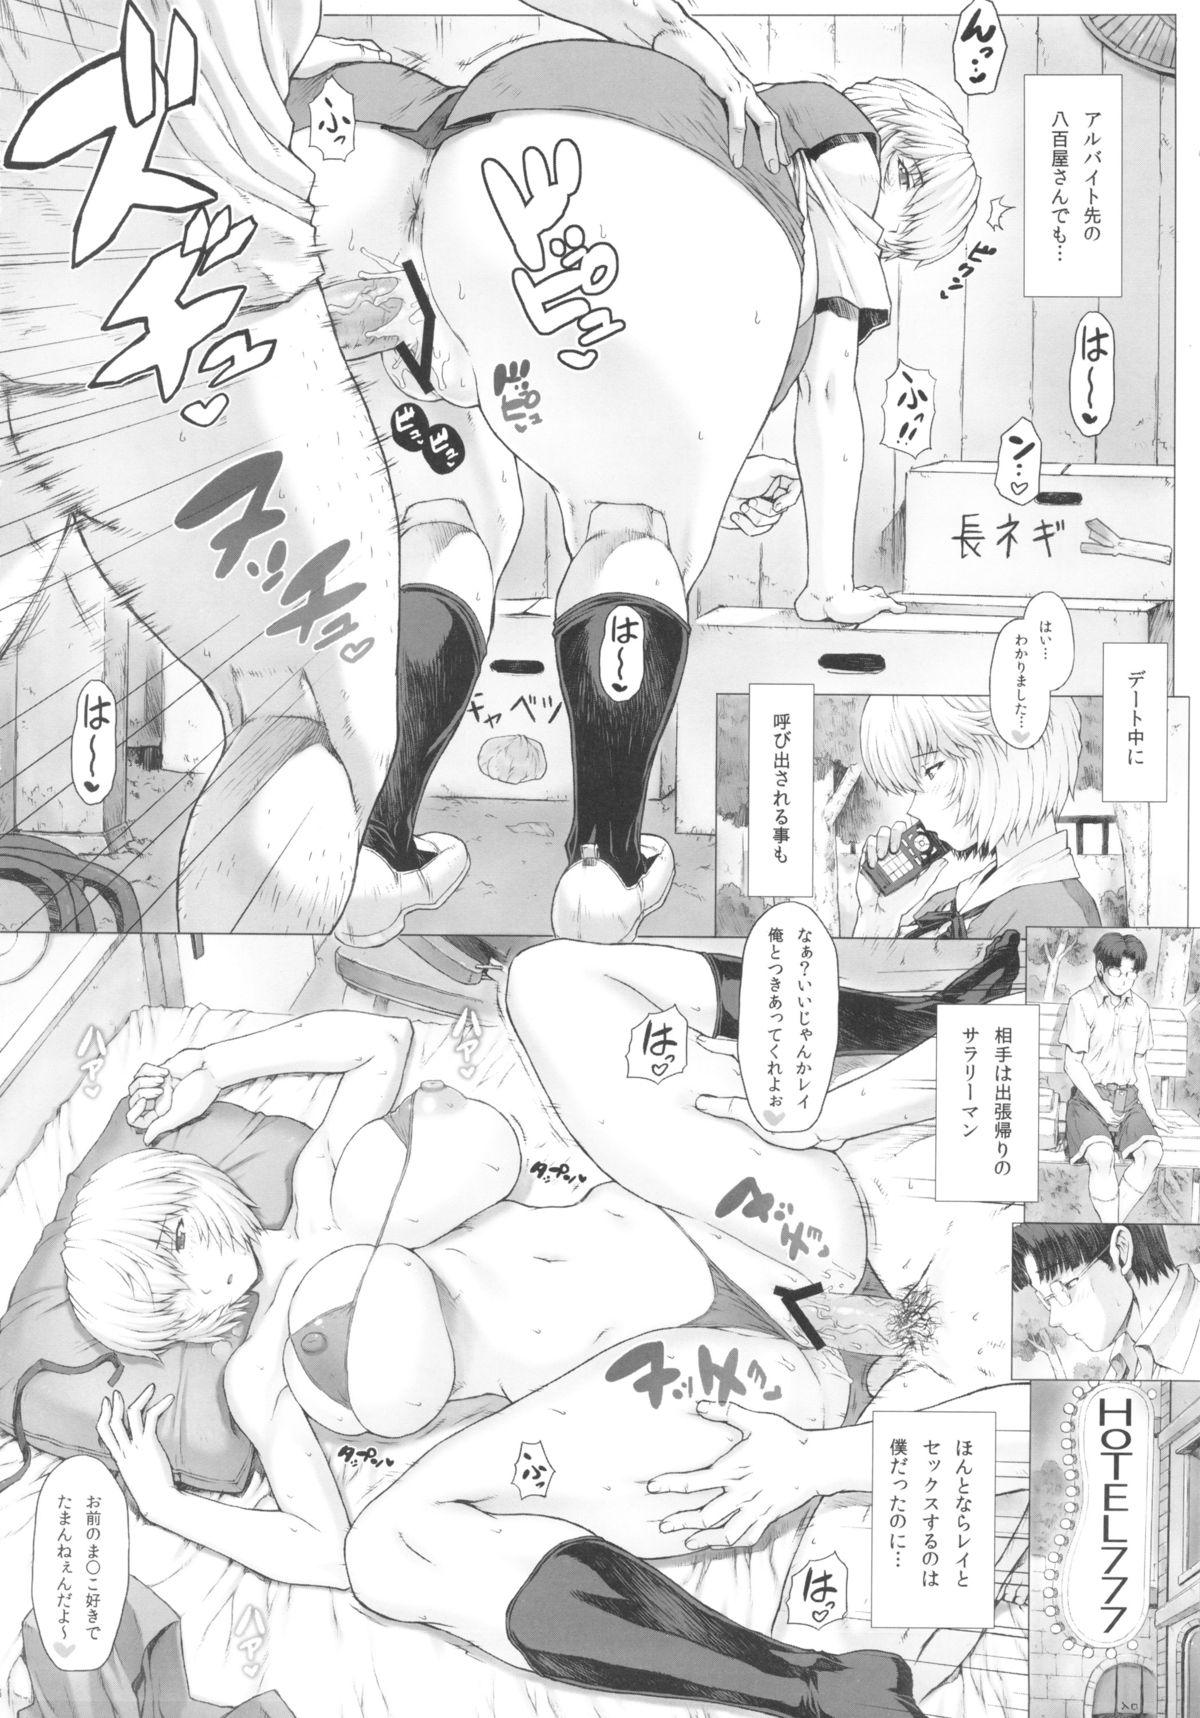 Ayanami Dai 4 Kai + Omake Bon + Postcard 27